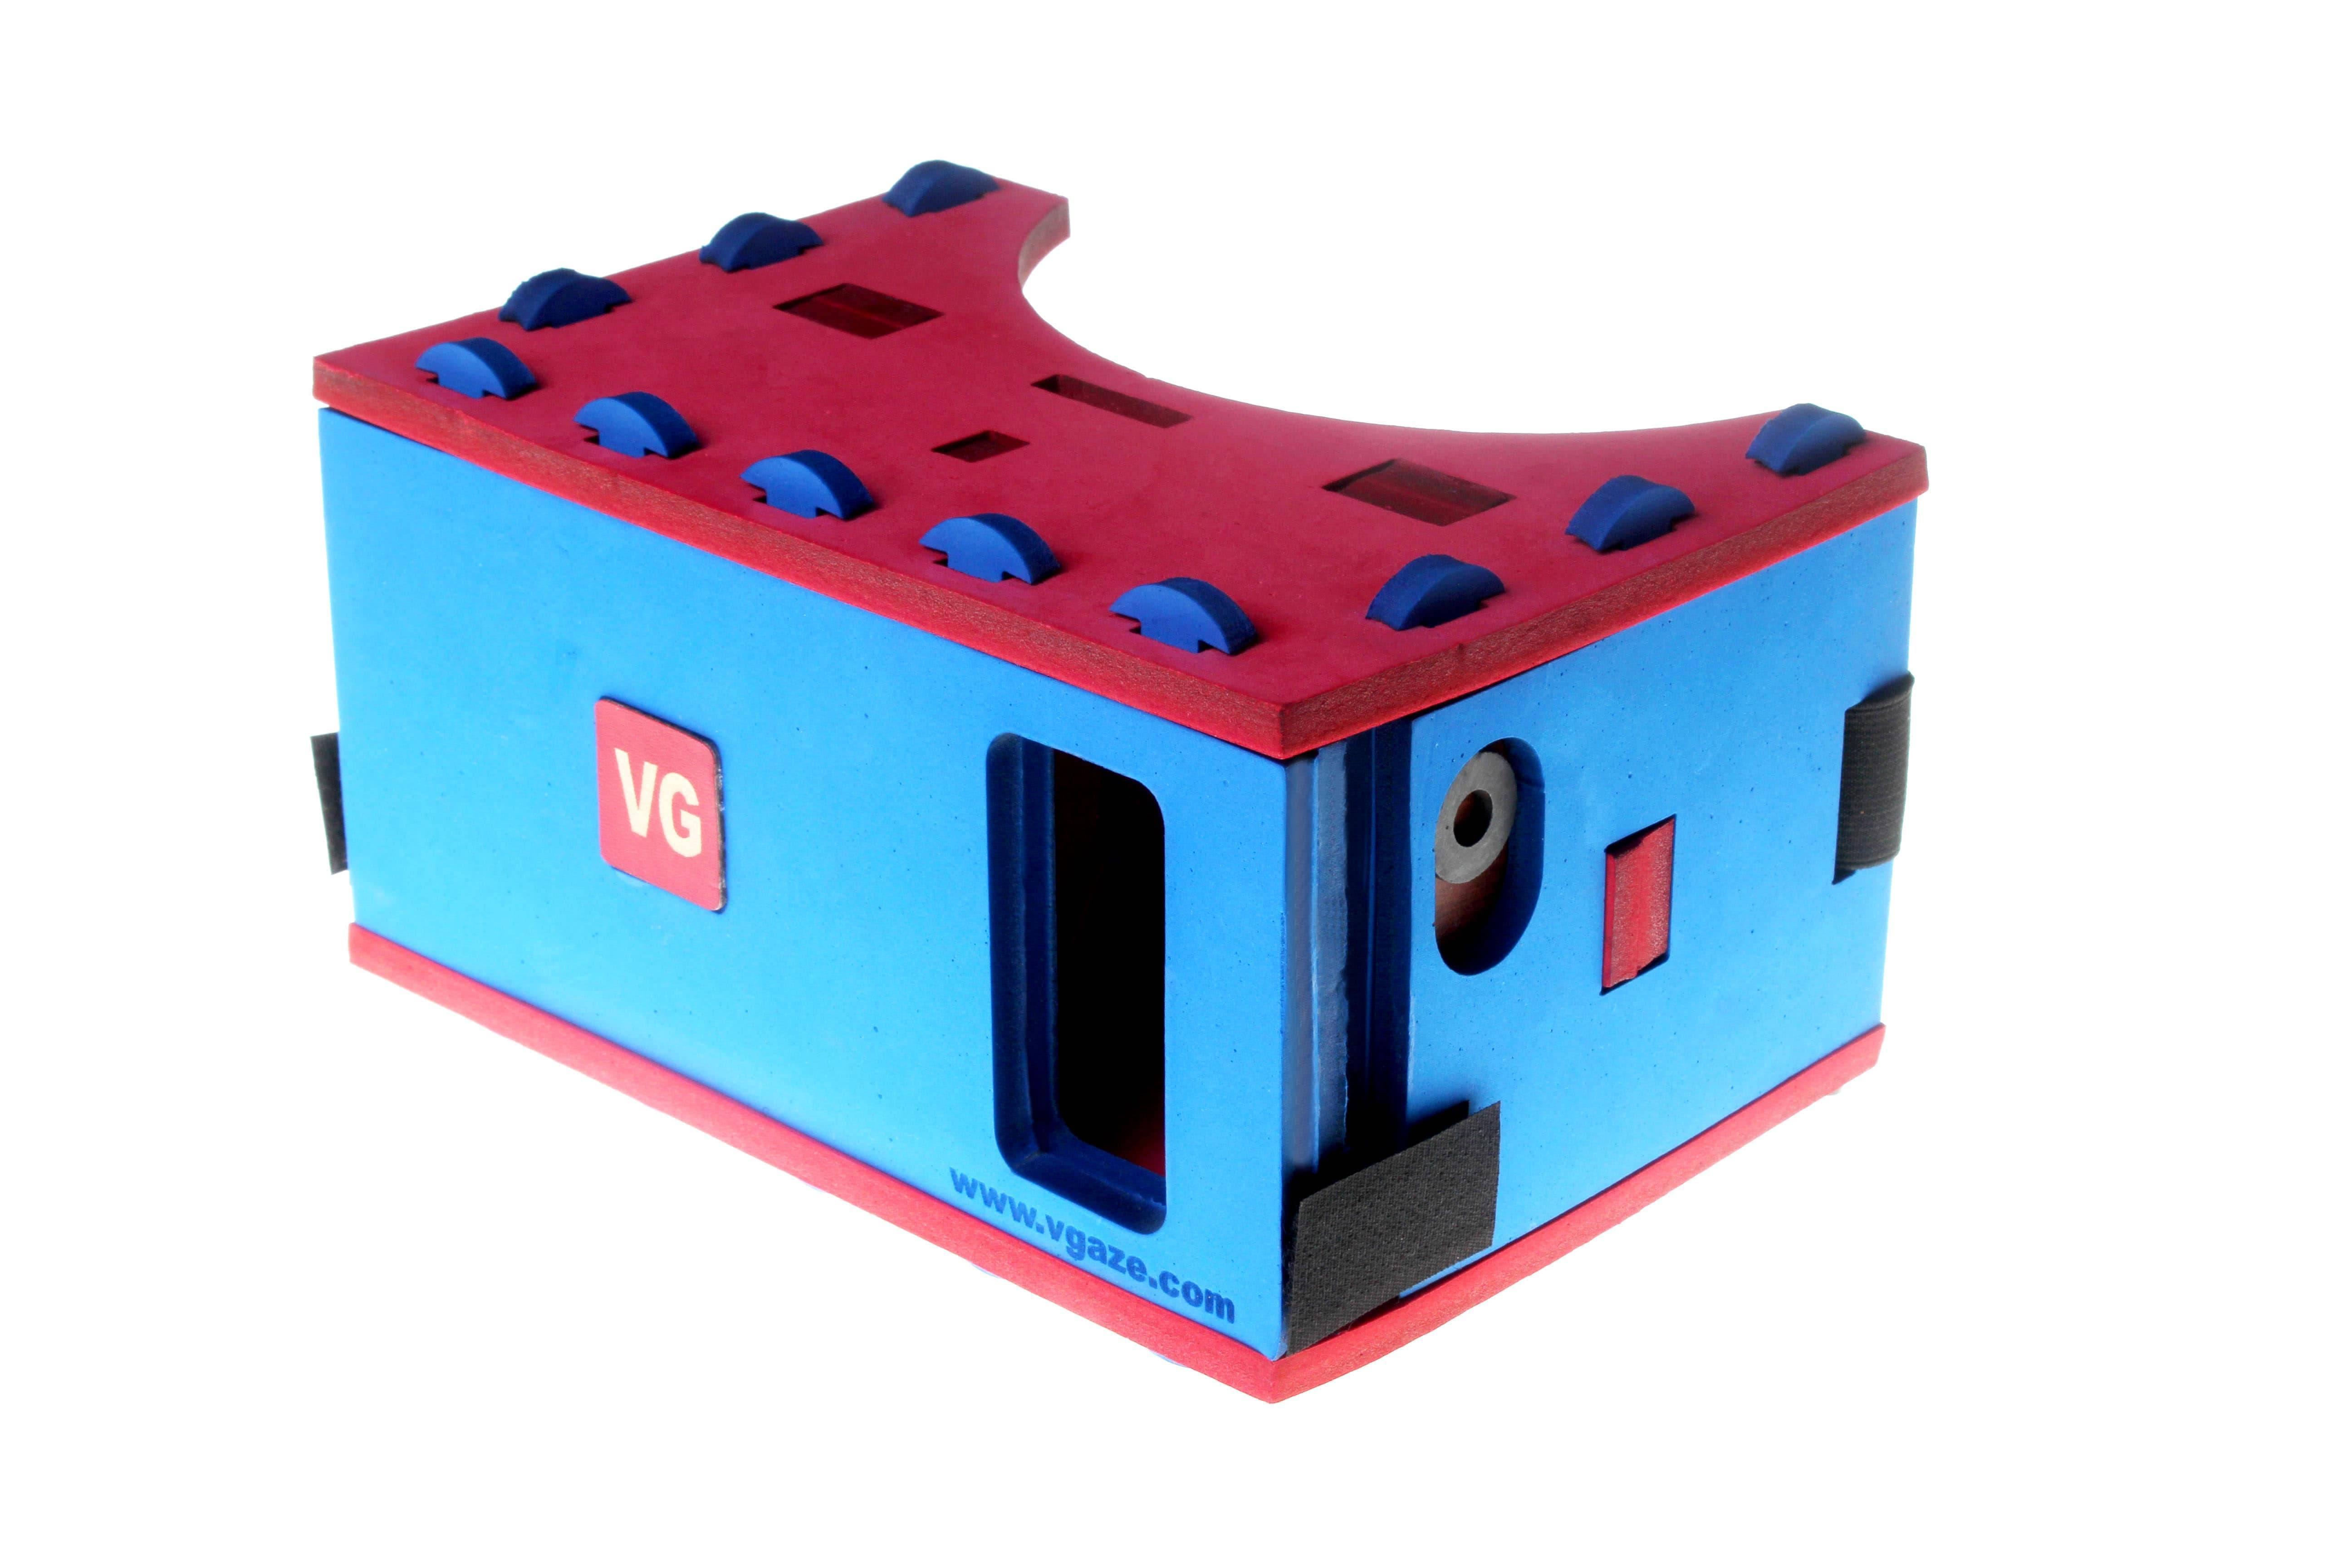 VG Virtual Reality Foam Premium